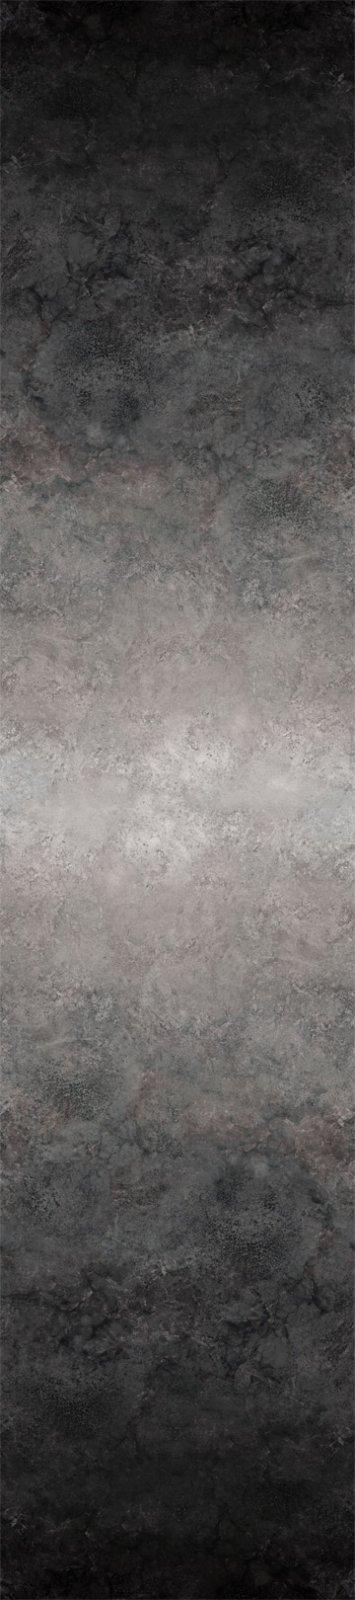 Stonehenge Gradations Ombre Wide #95 Grays